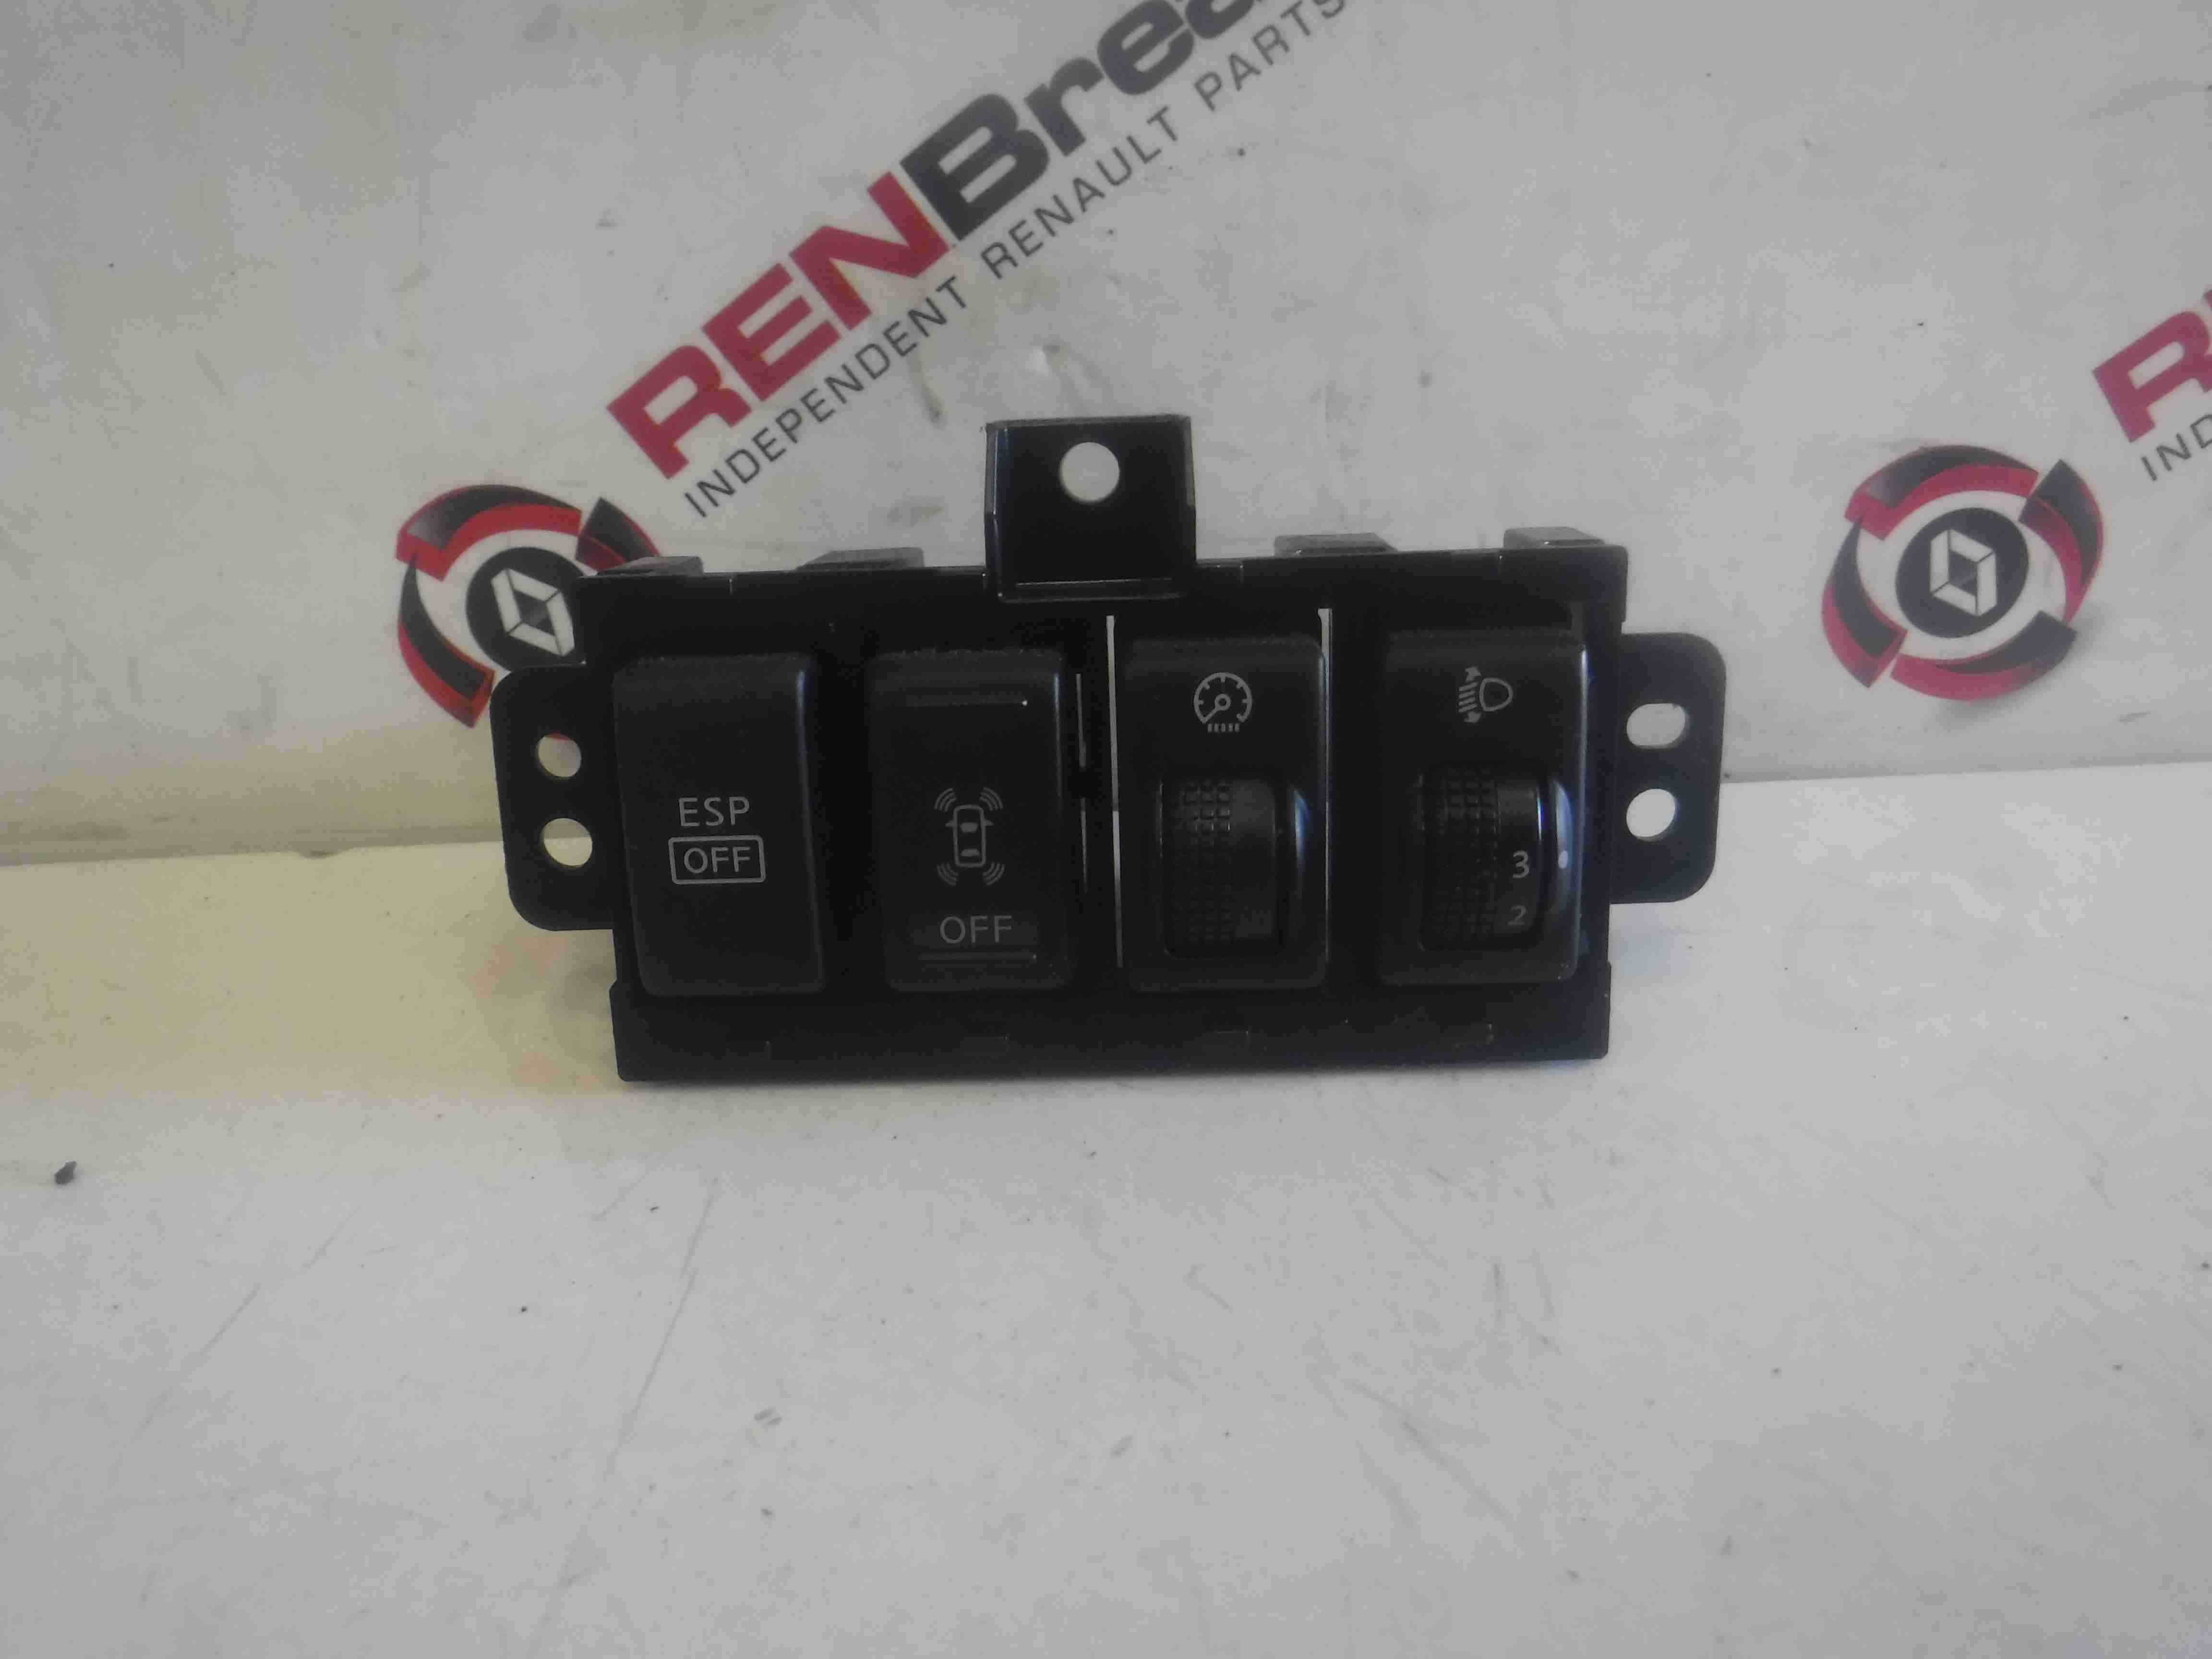 Renault Koleos 2008-2015 ESP Off Speed Limiter Headlight Adjuster